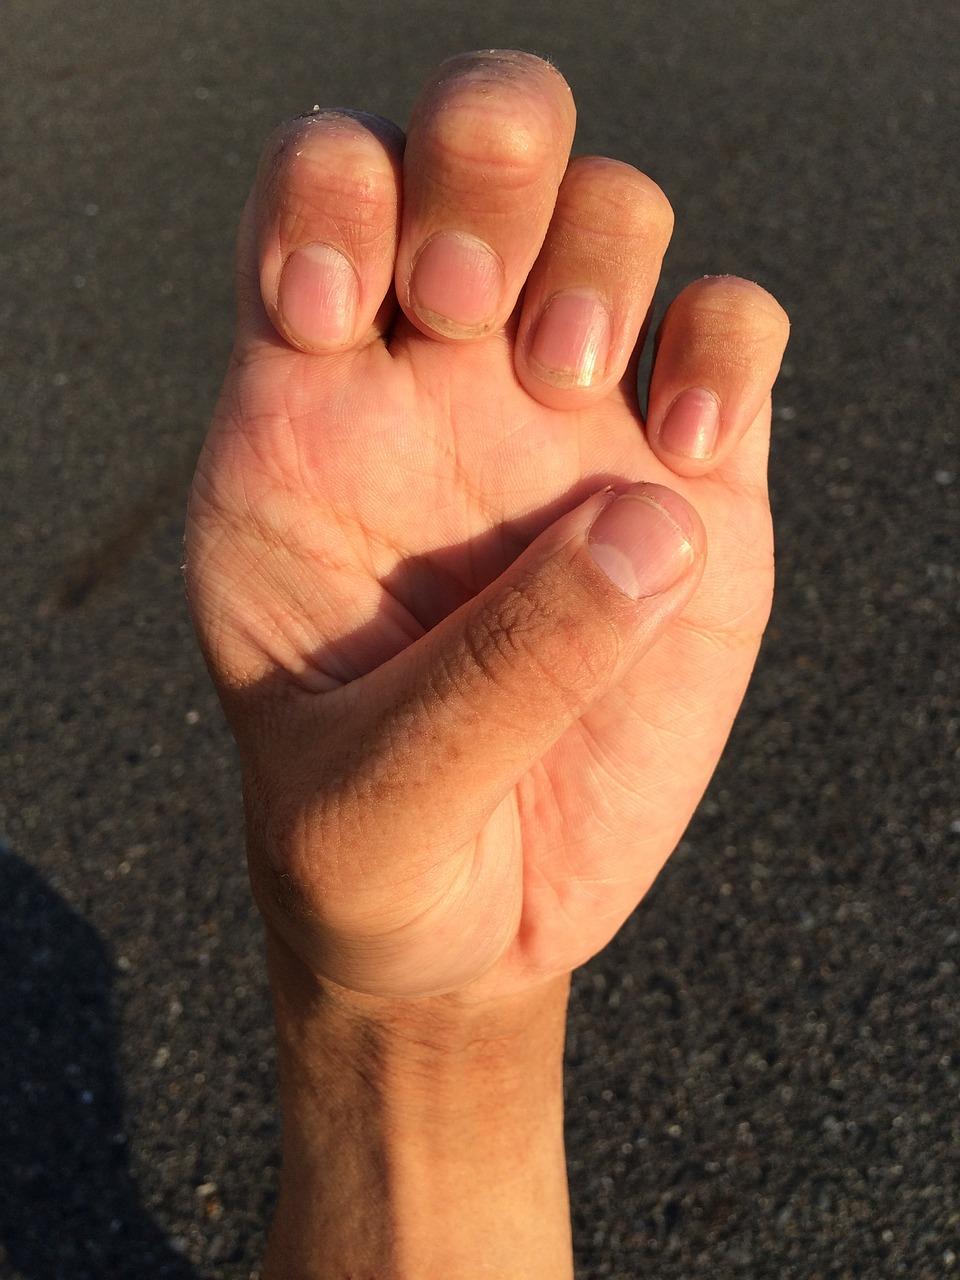 hand 1701954 1280 - 死んでもいいほど気持ちいい!前立腺の刺激の開発方法まとめ